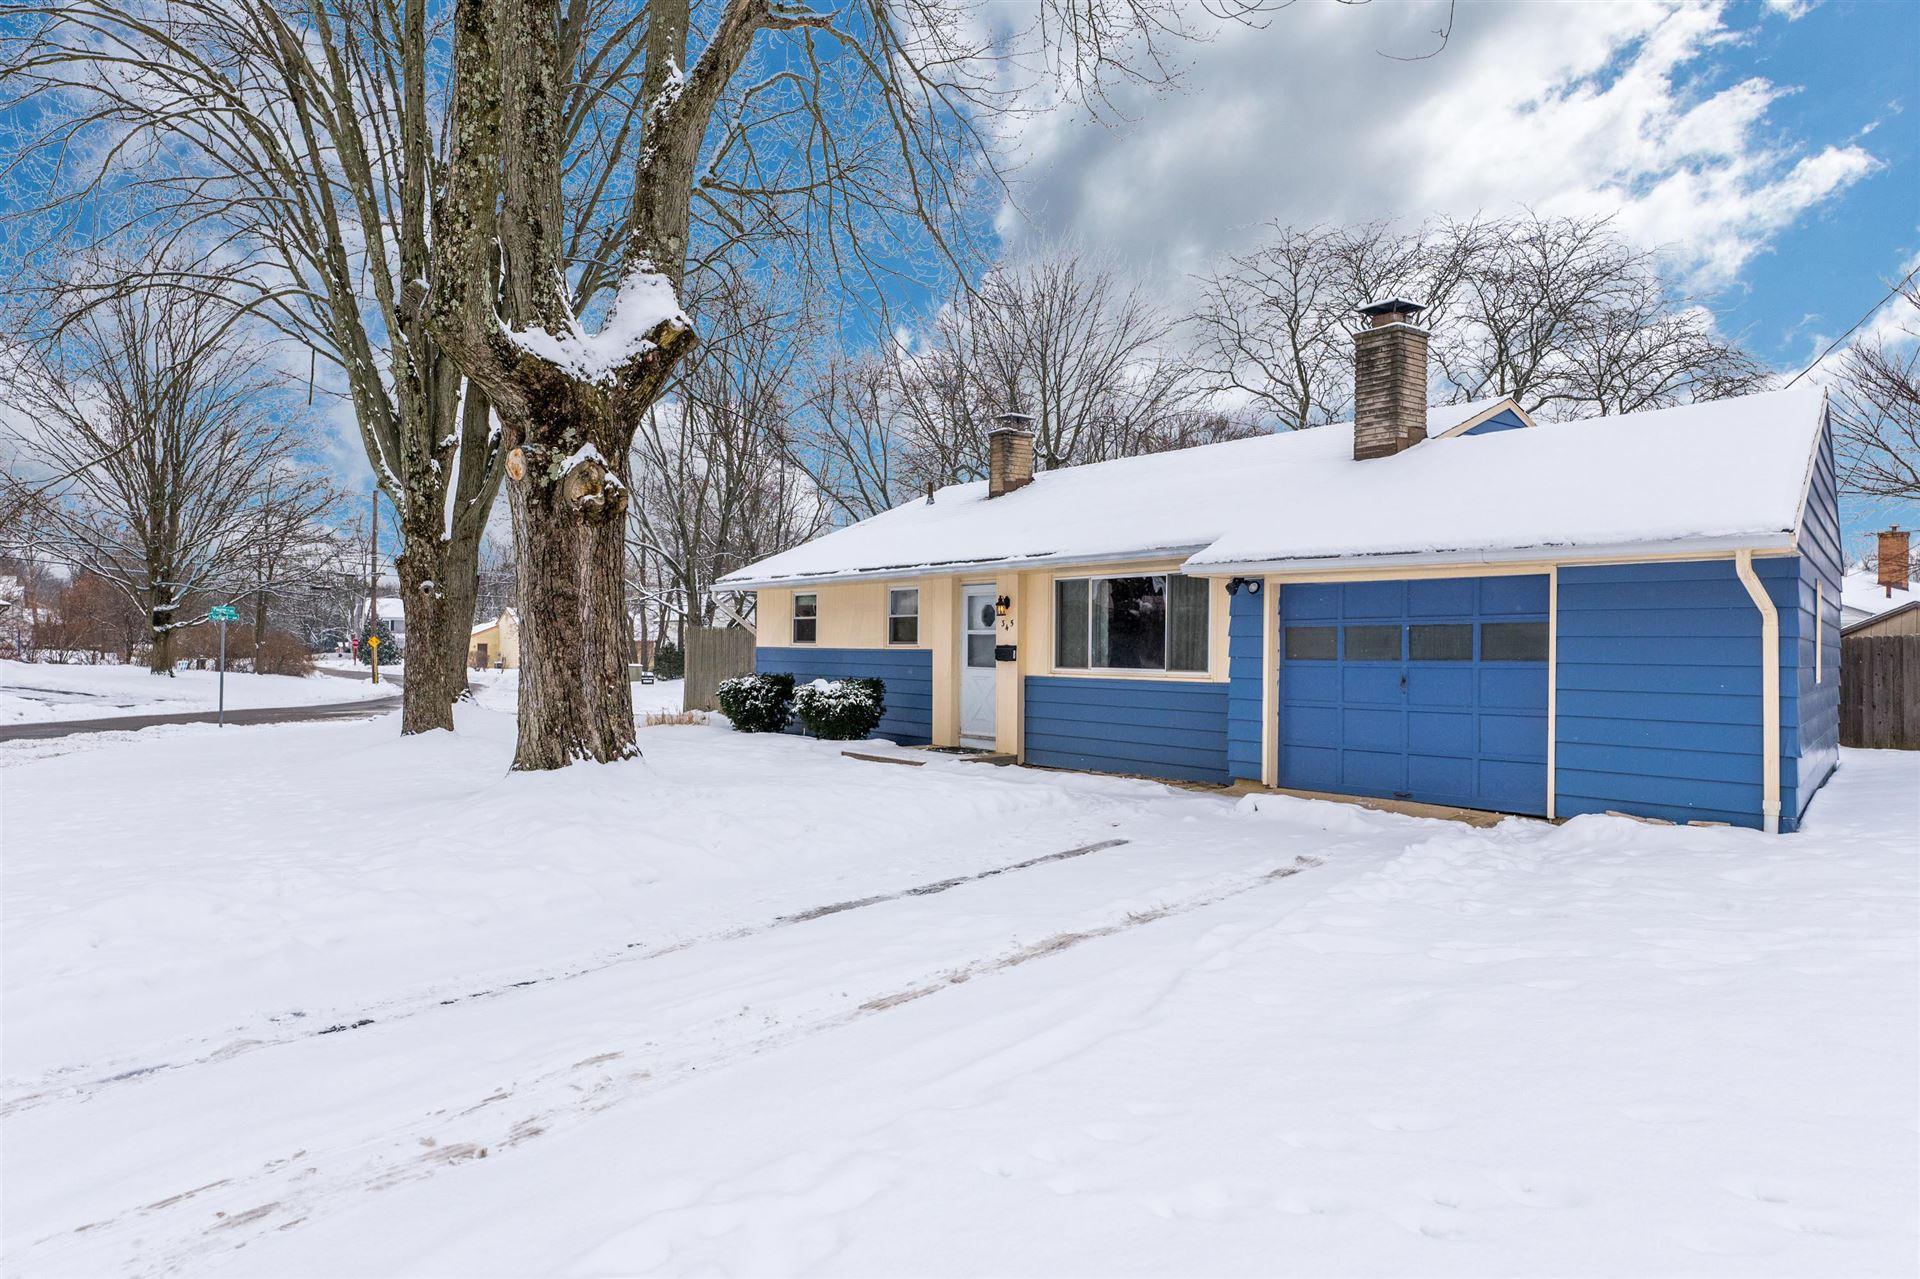 Photo of 345 Pingree Drive, Worthington, OH 43085 (MLS # 221003984)